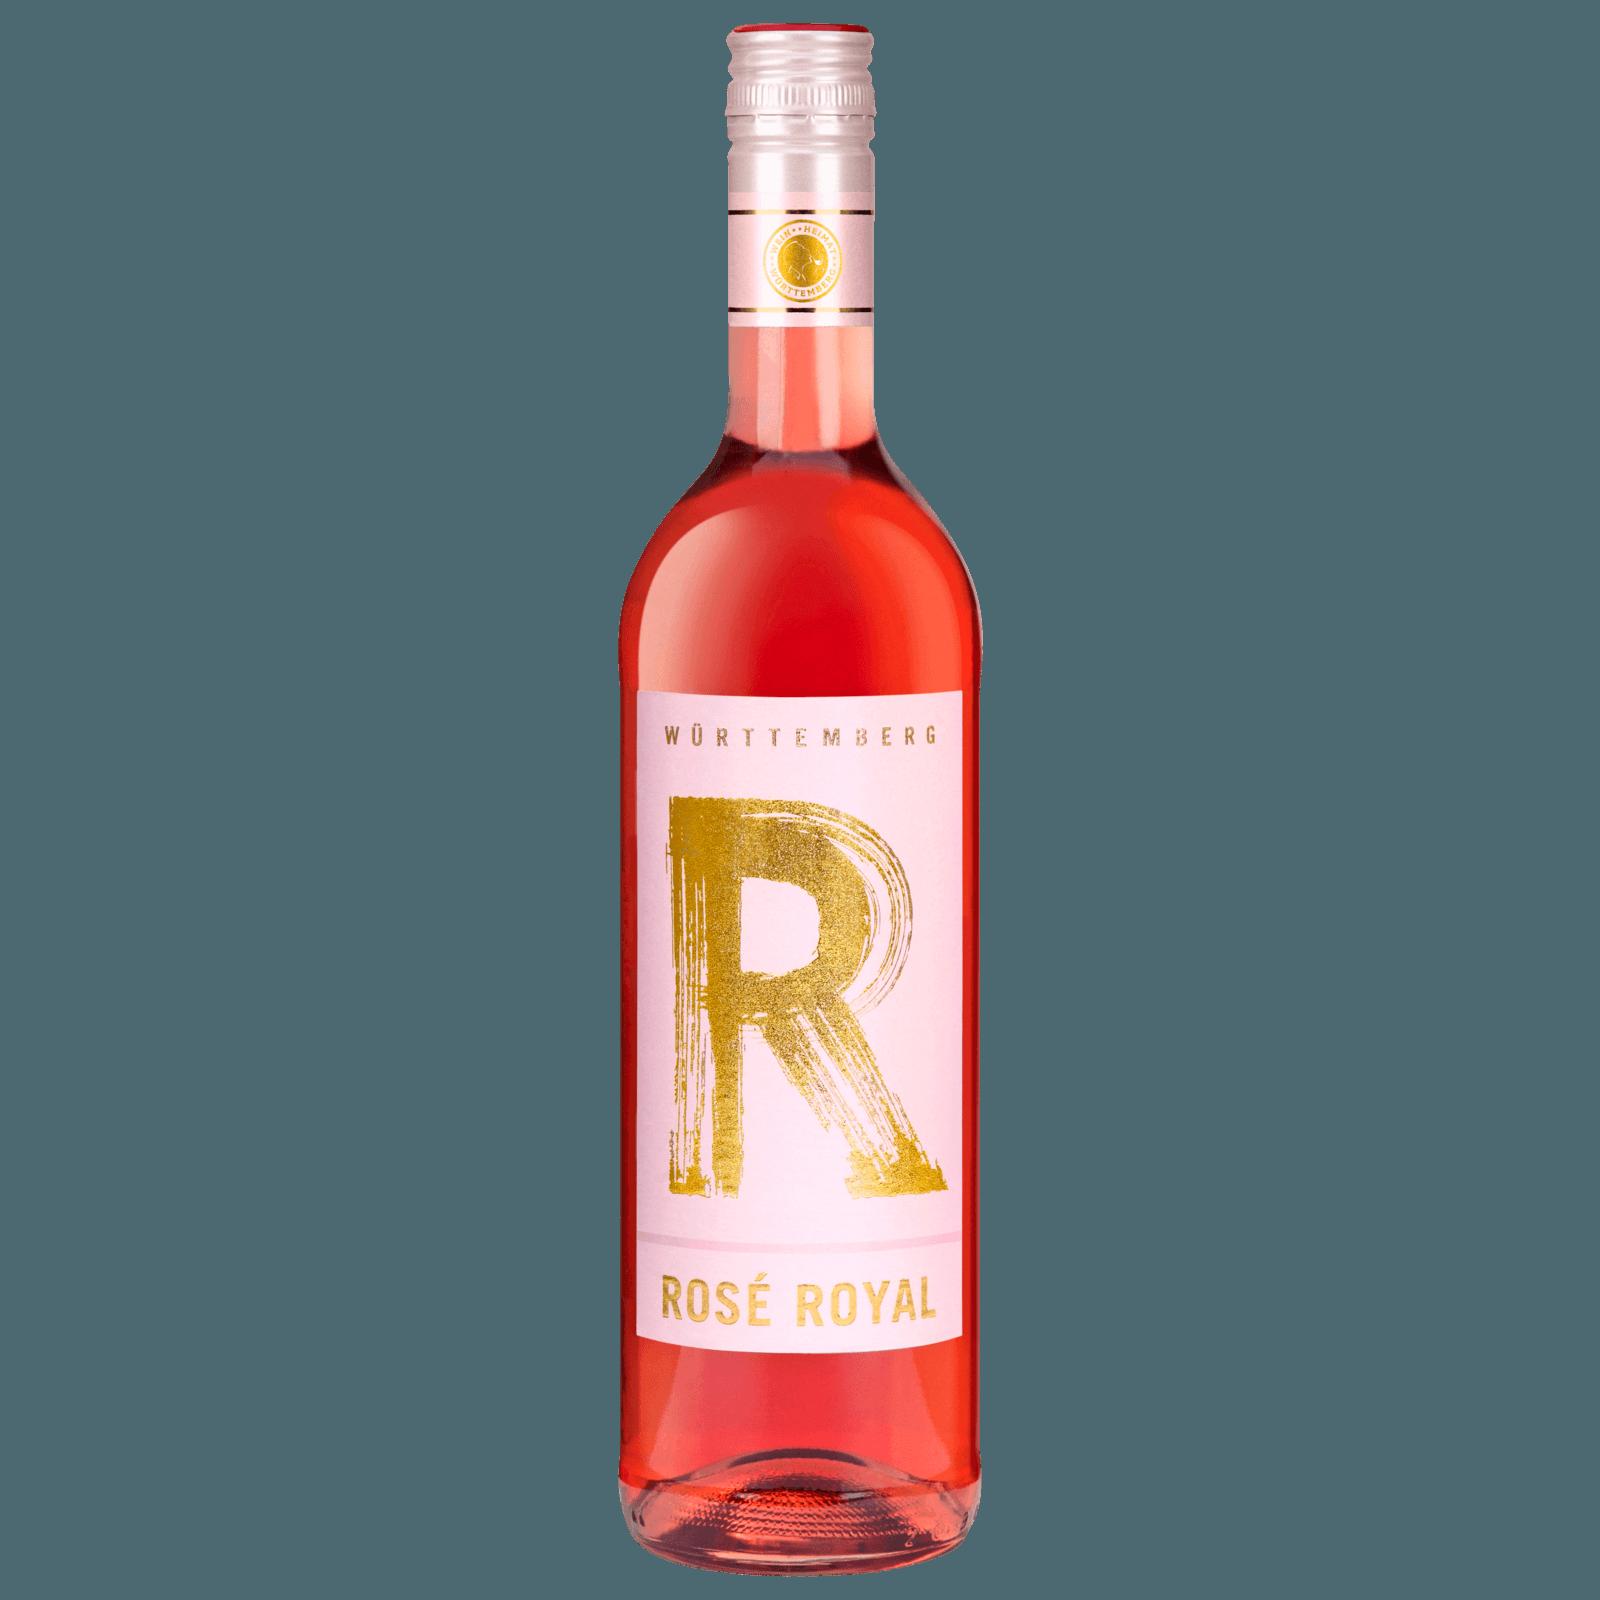 Württemberger Rosé Royal 0,75l